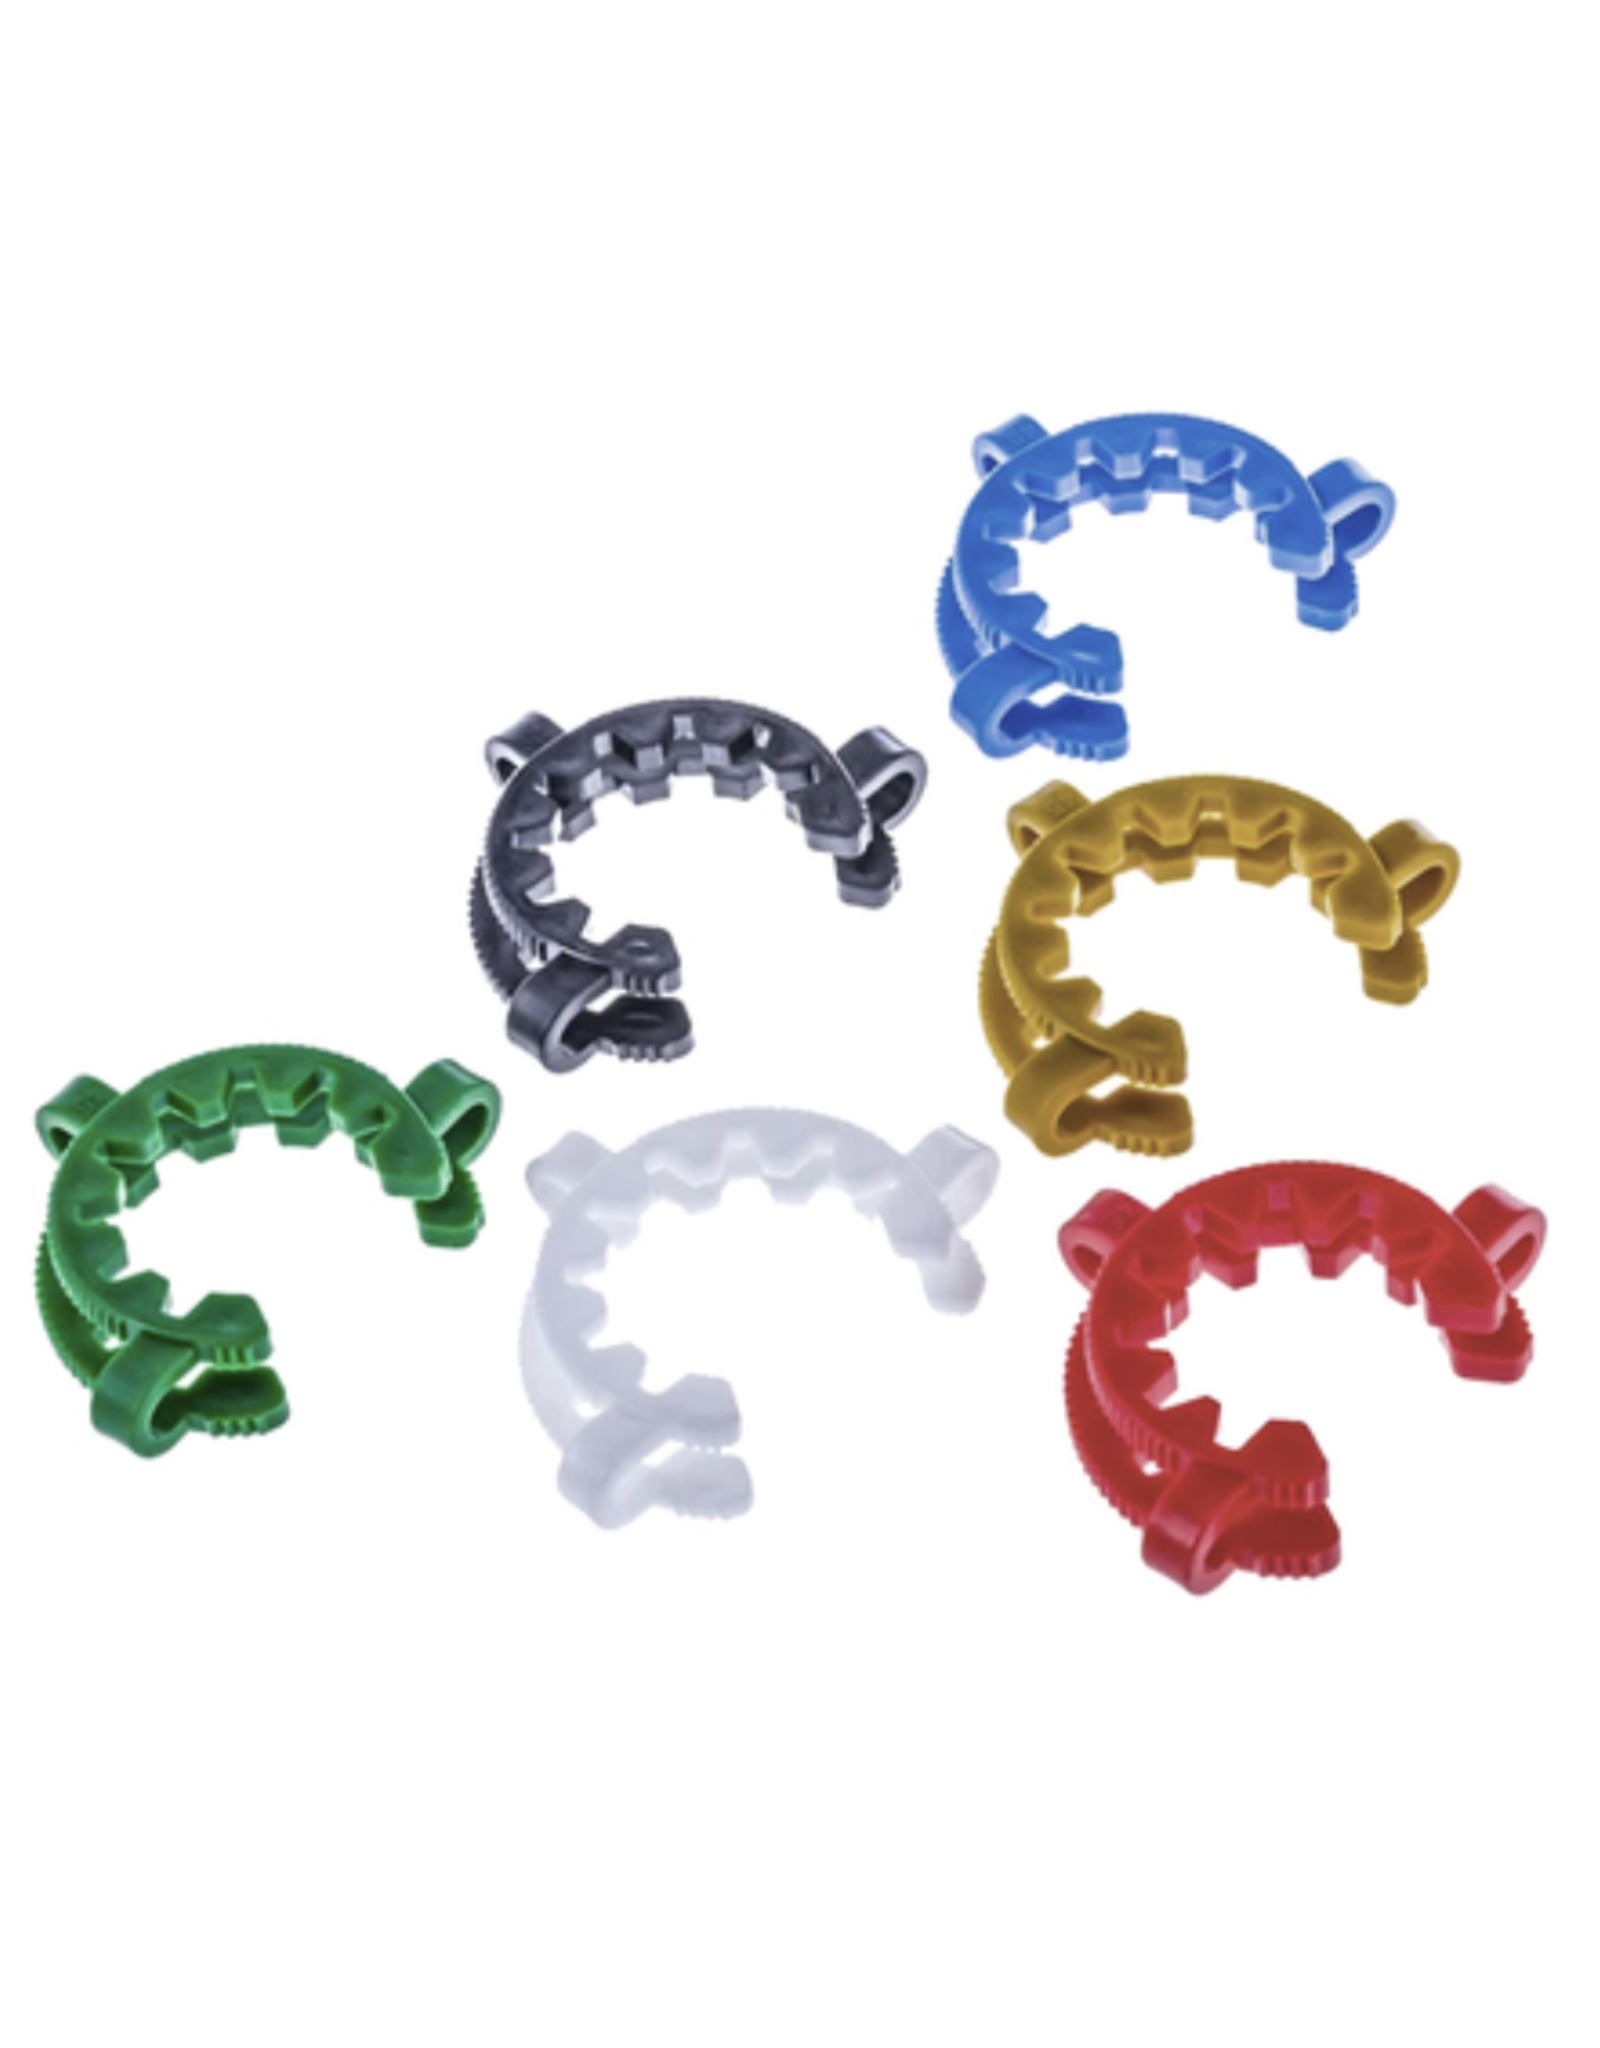 Hoss 50mm K-Clip - Assorted Colours